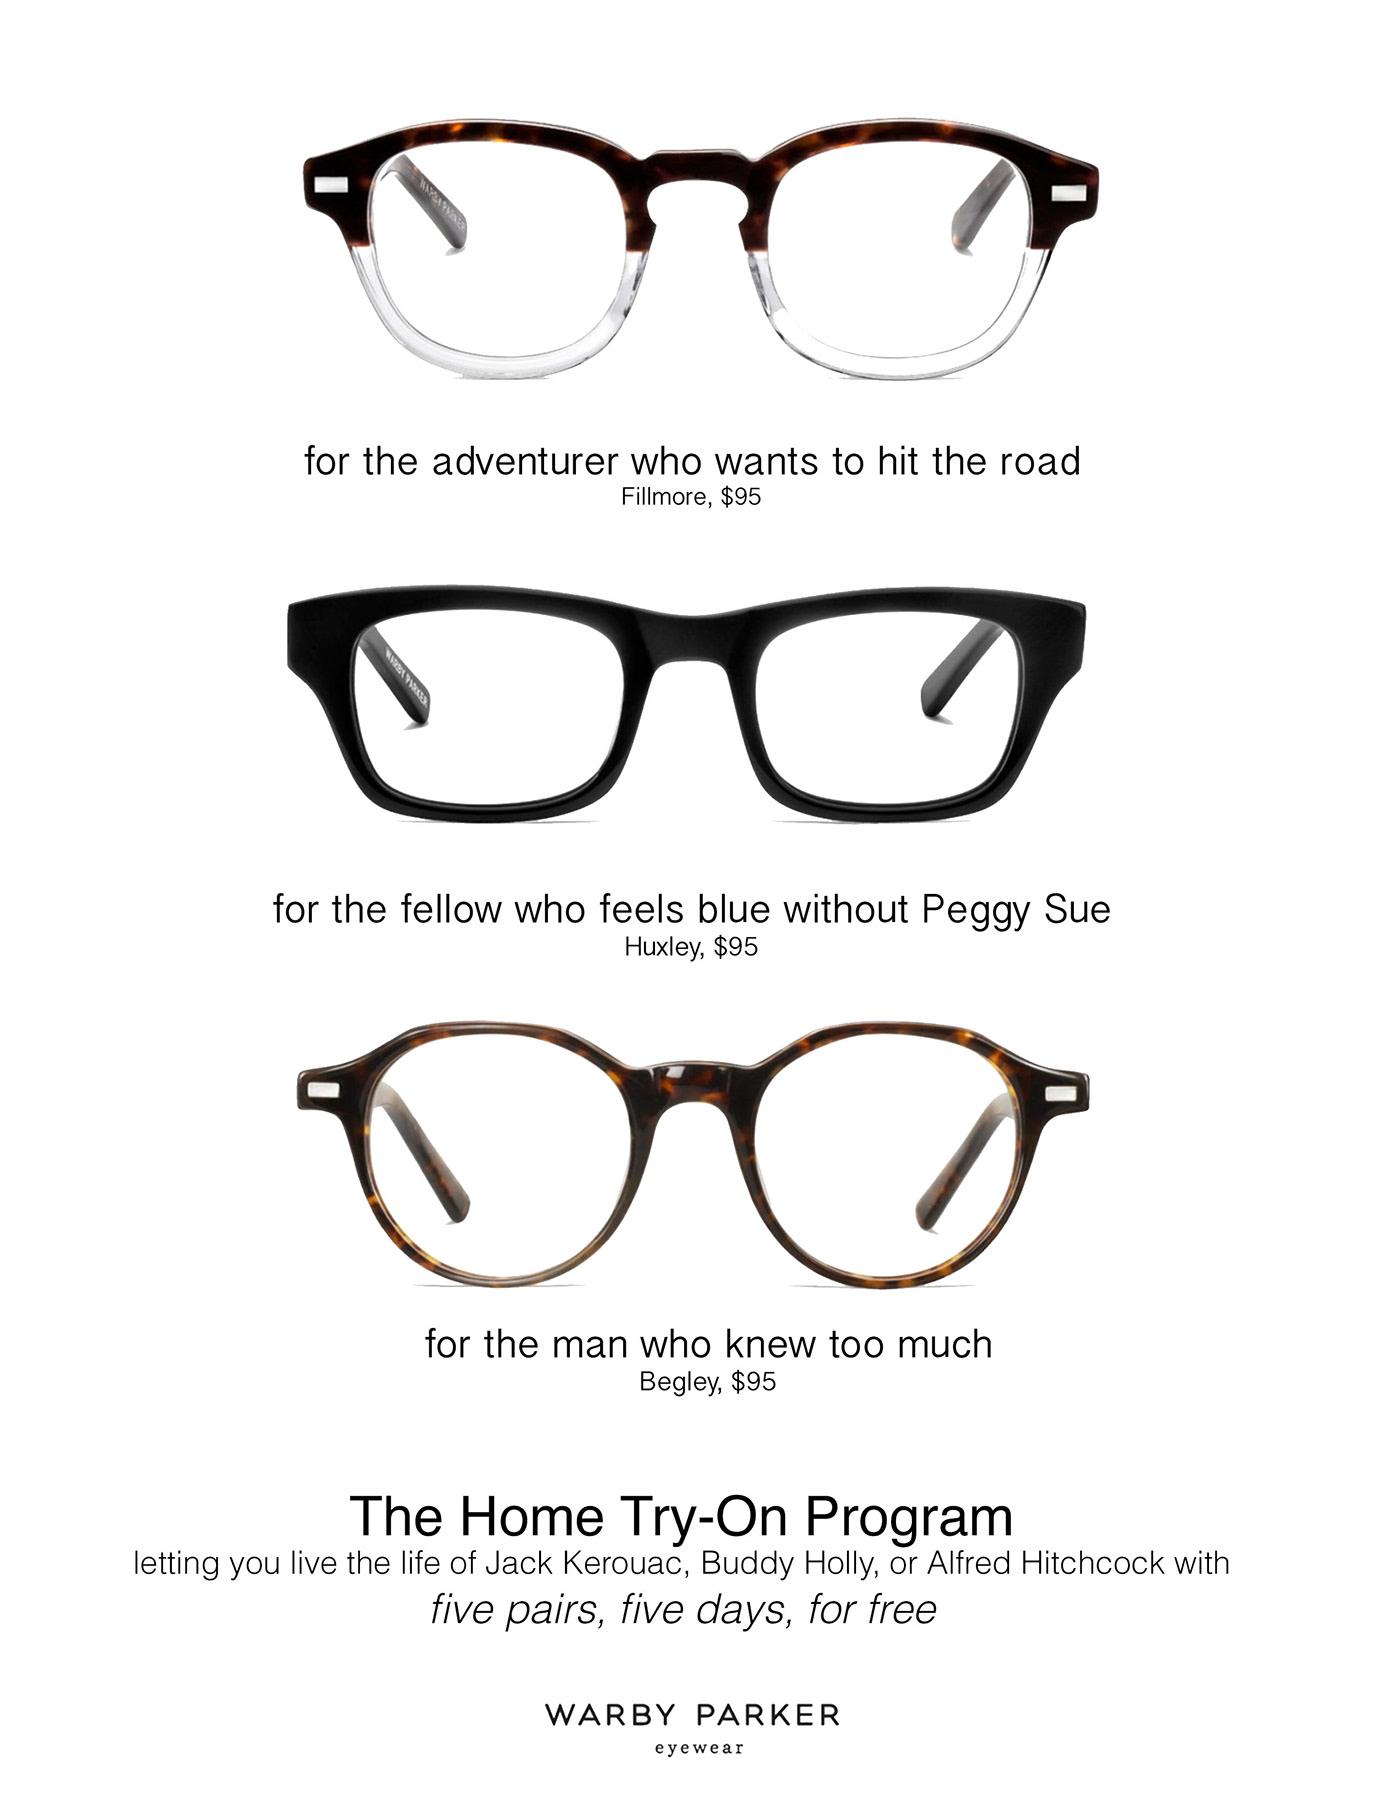 9dbbdd84b2b Warby Parker  Home Try-On Program on Behance